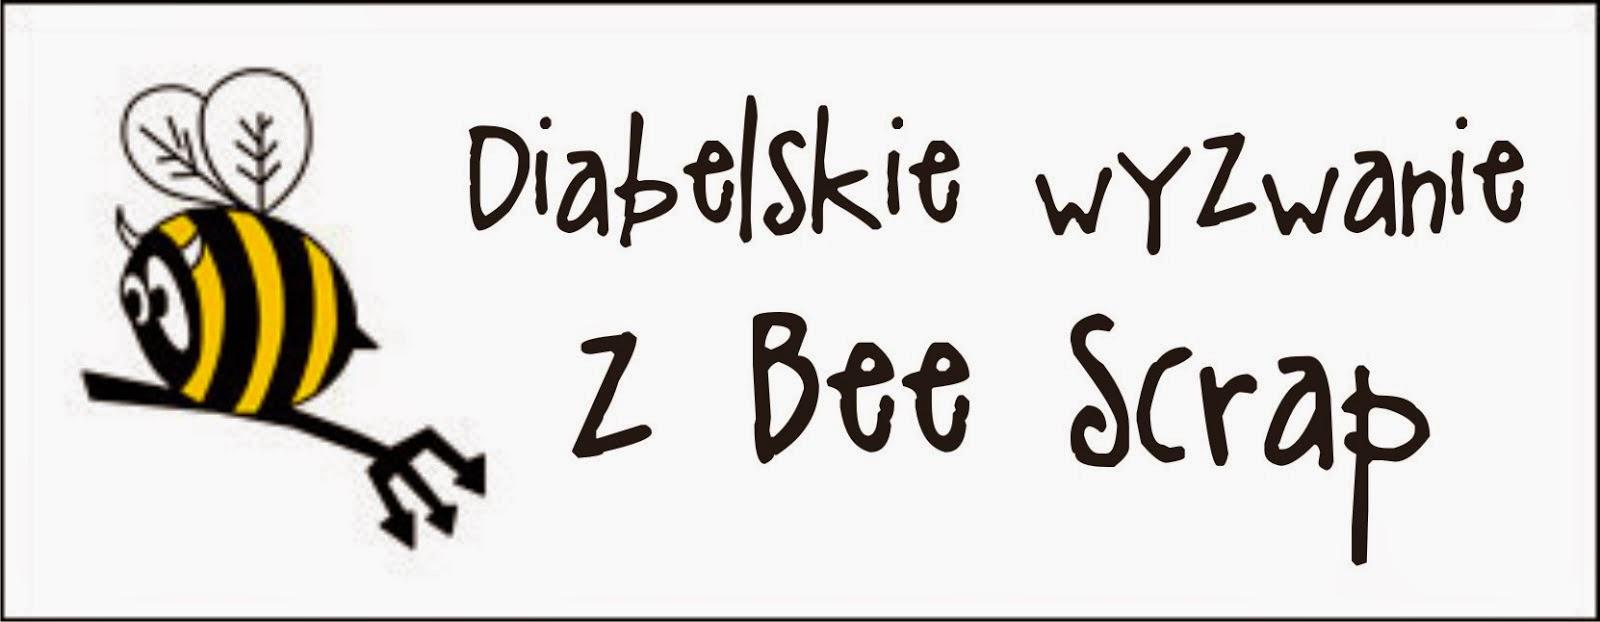 http://diabelskimlyn.blogspot.com/2015/04/diabelskie-wyzwanie-z-bee-scrap.html